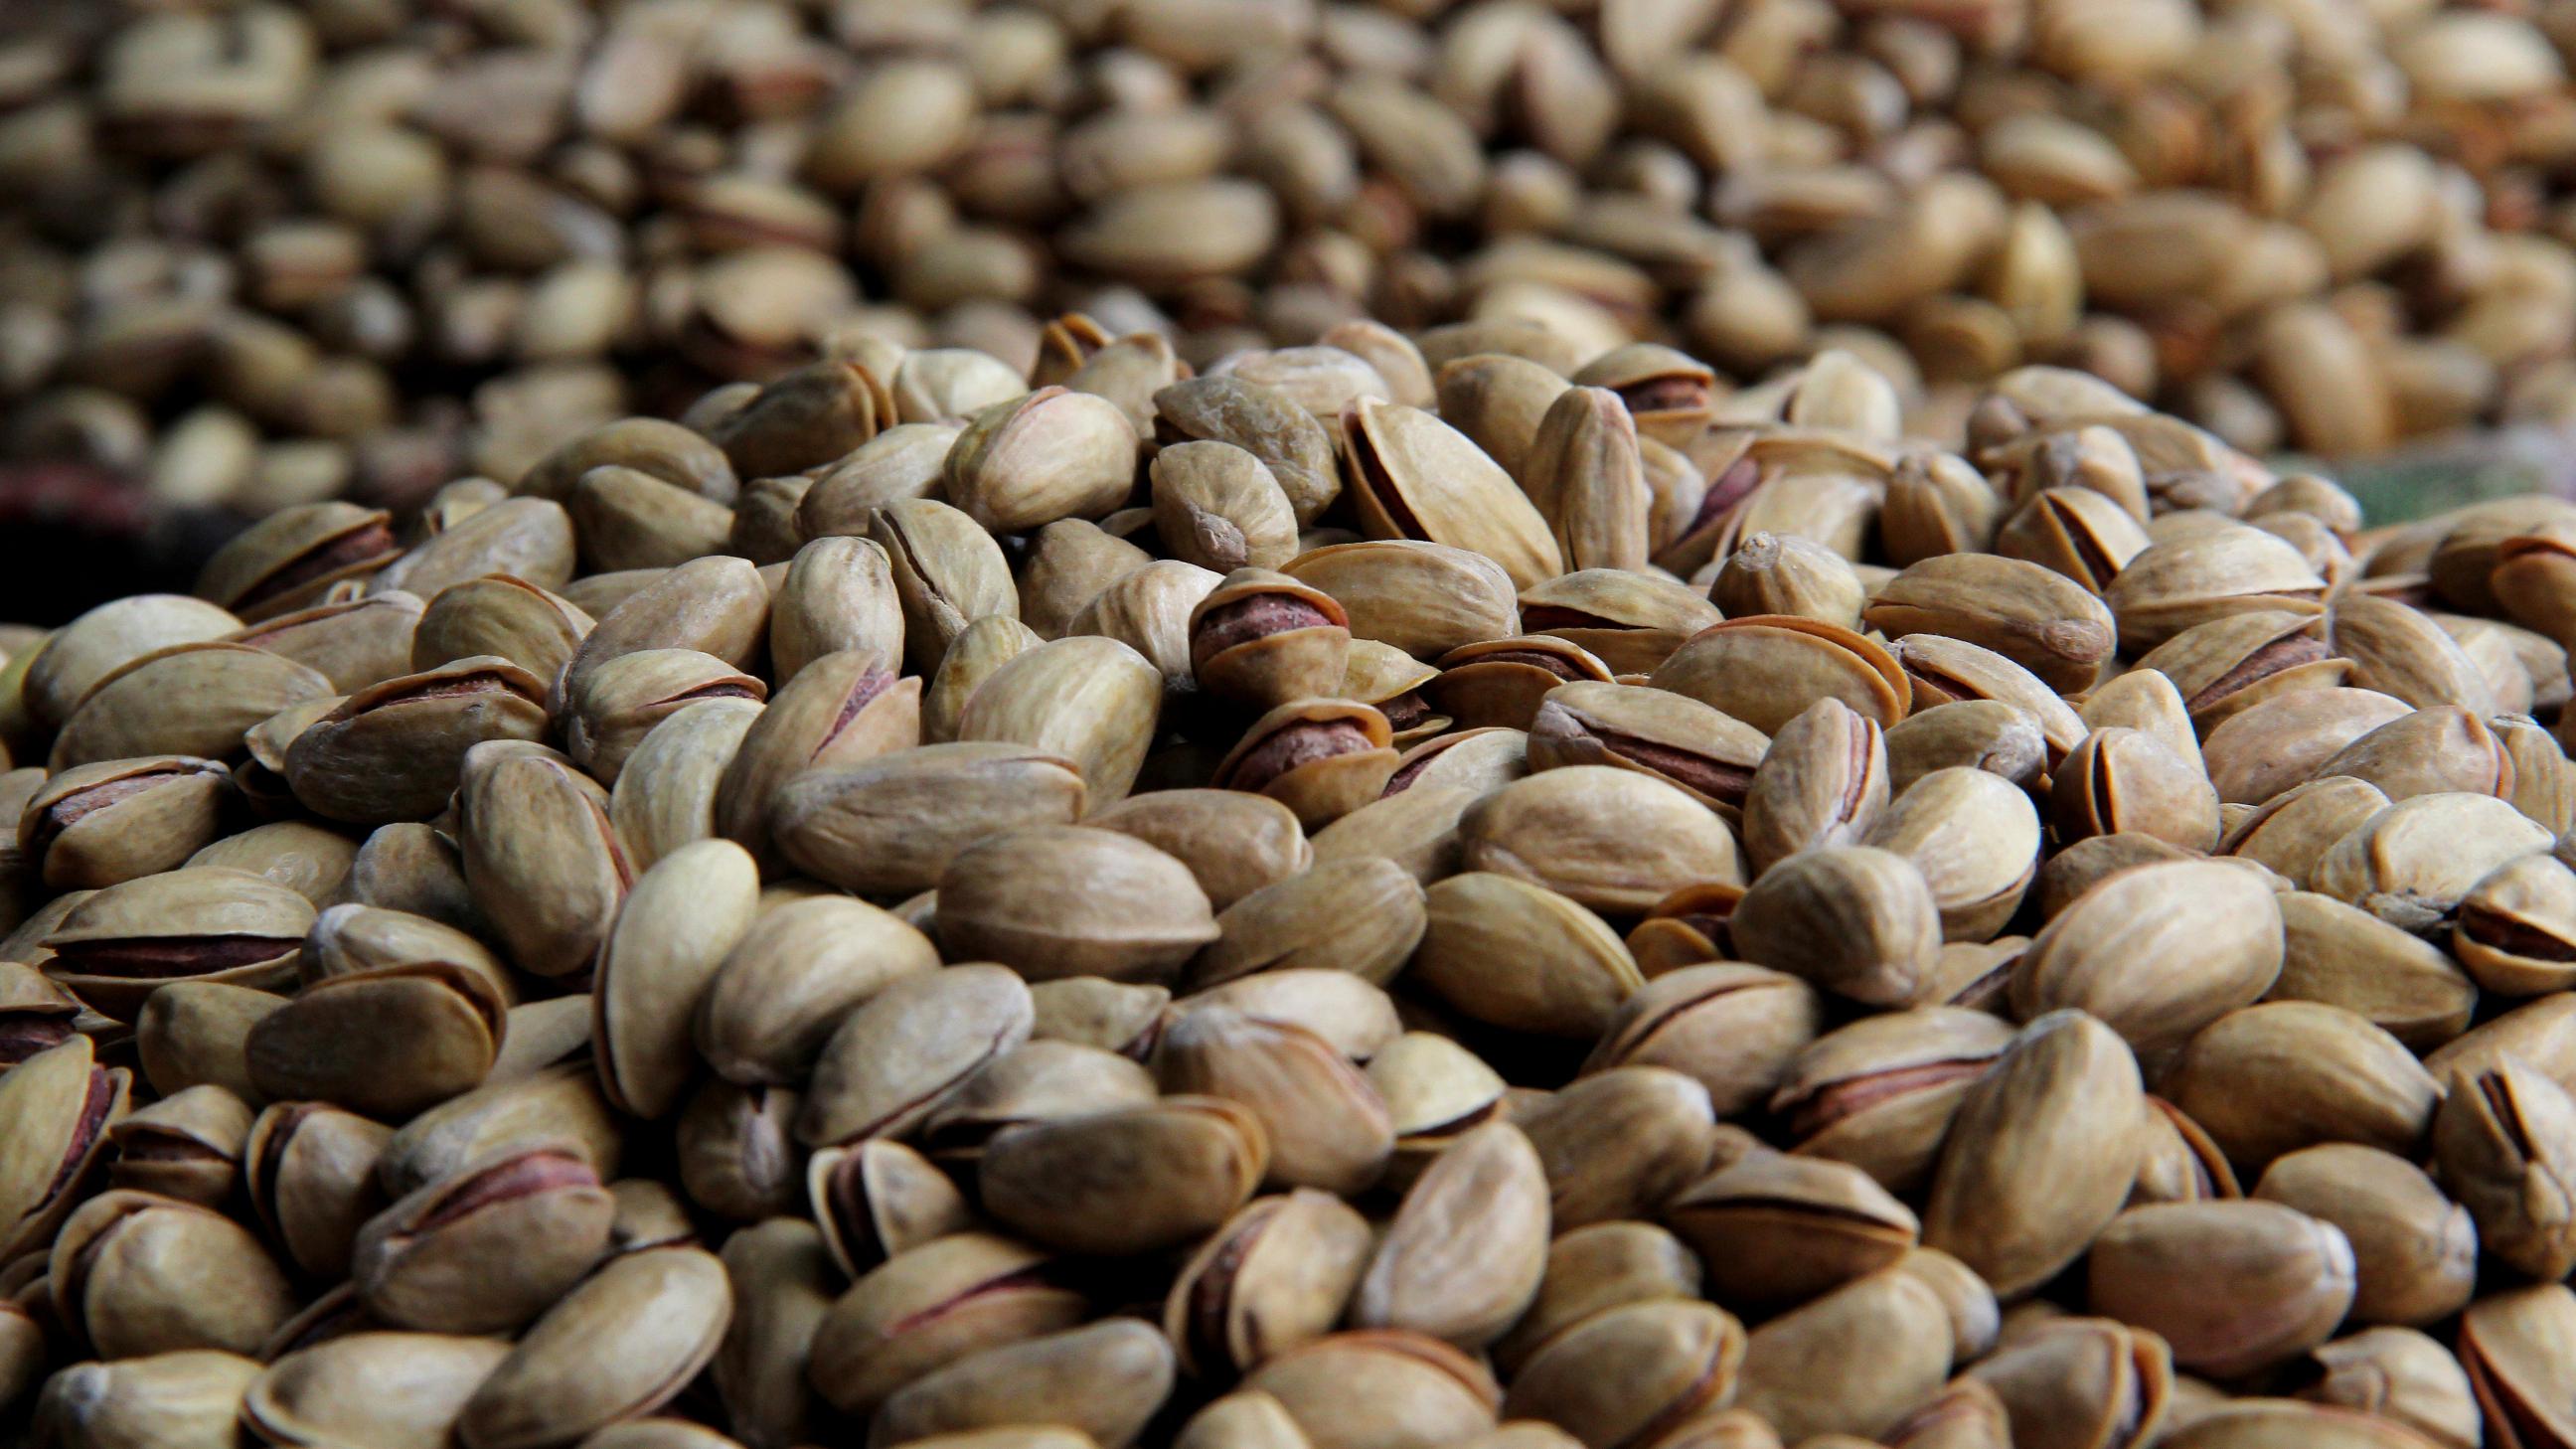 Turkey Looks For Energy In An Abundant Resource: Pistachio Shells